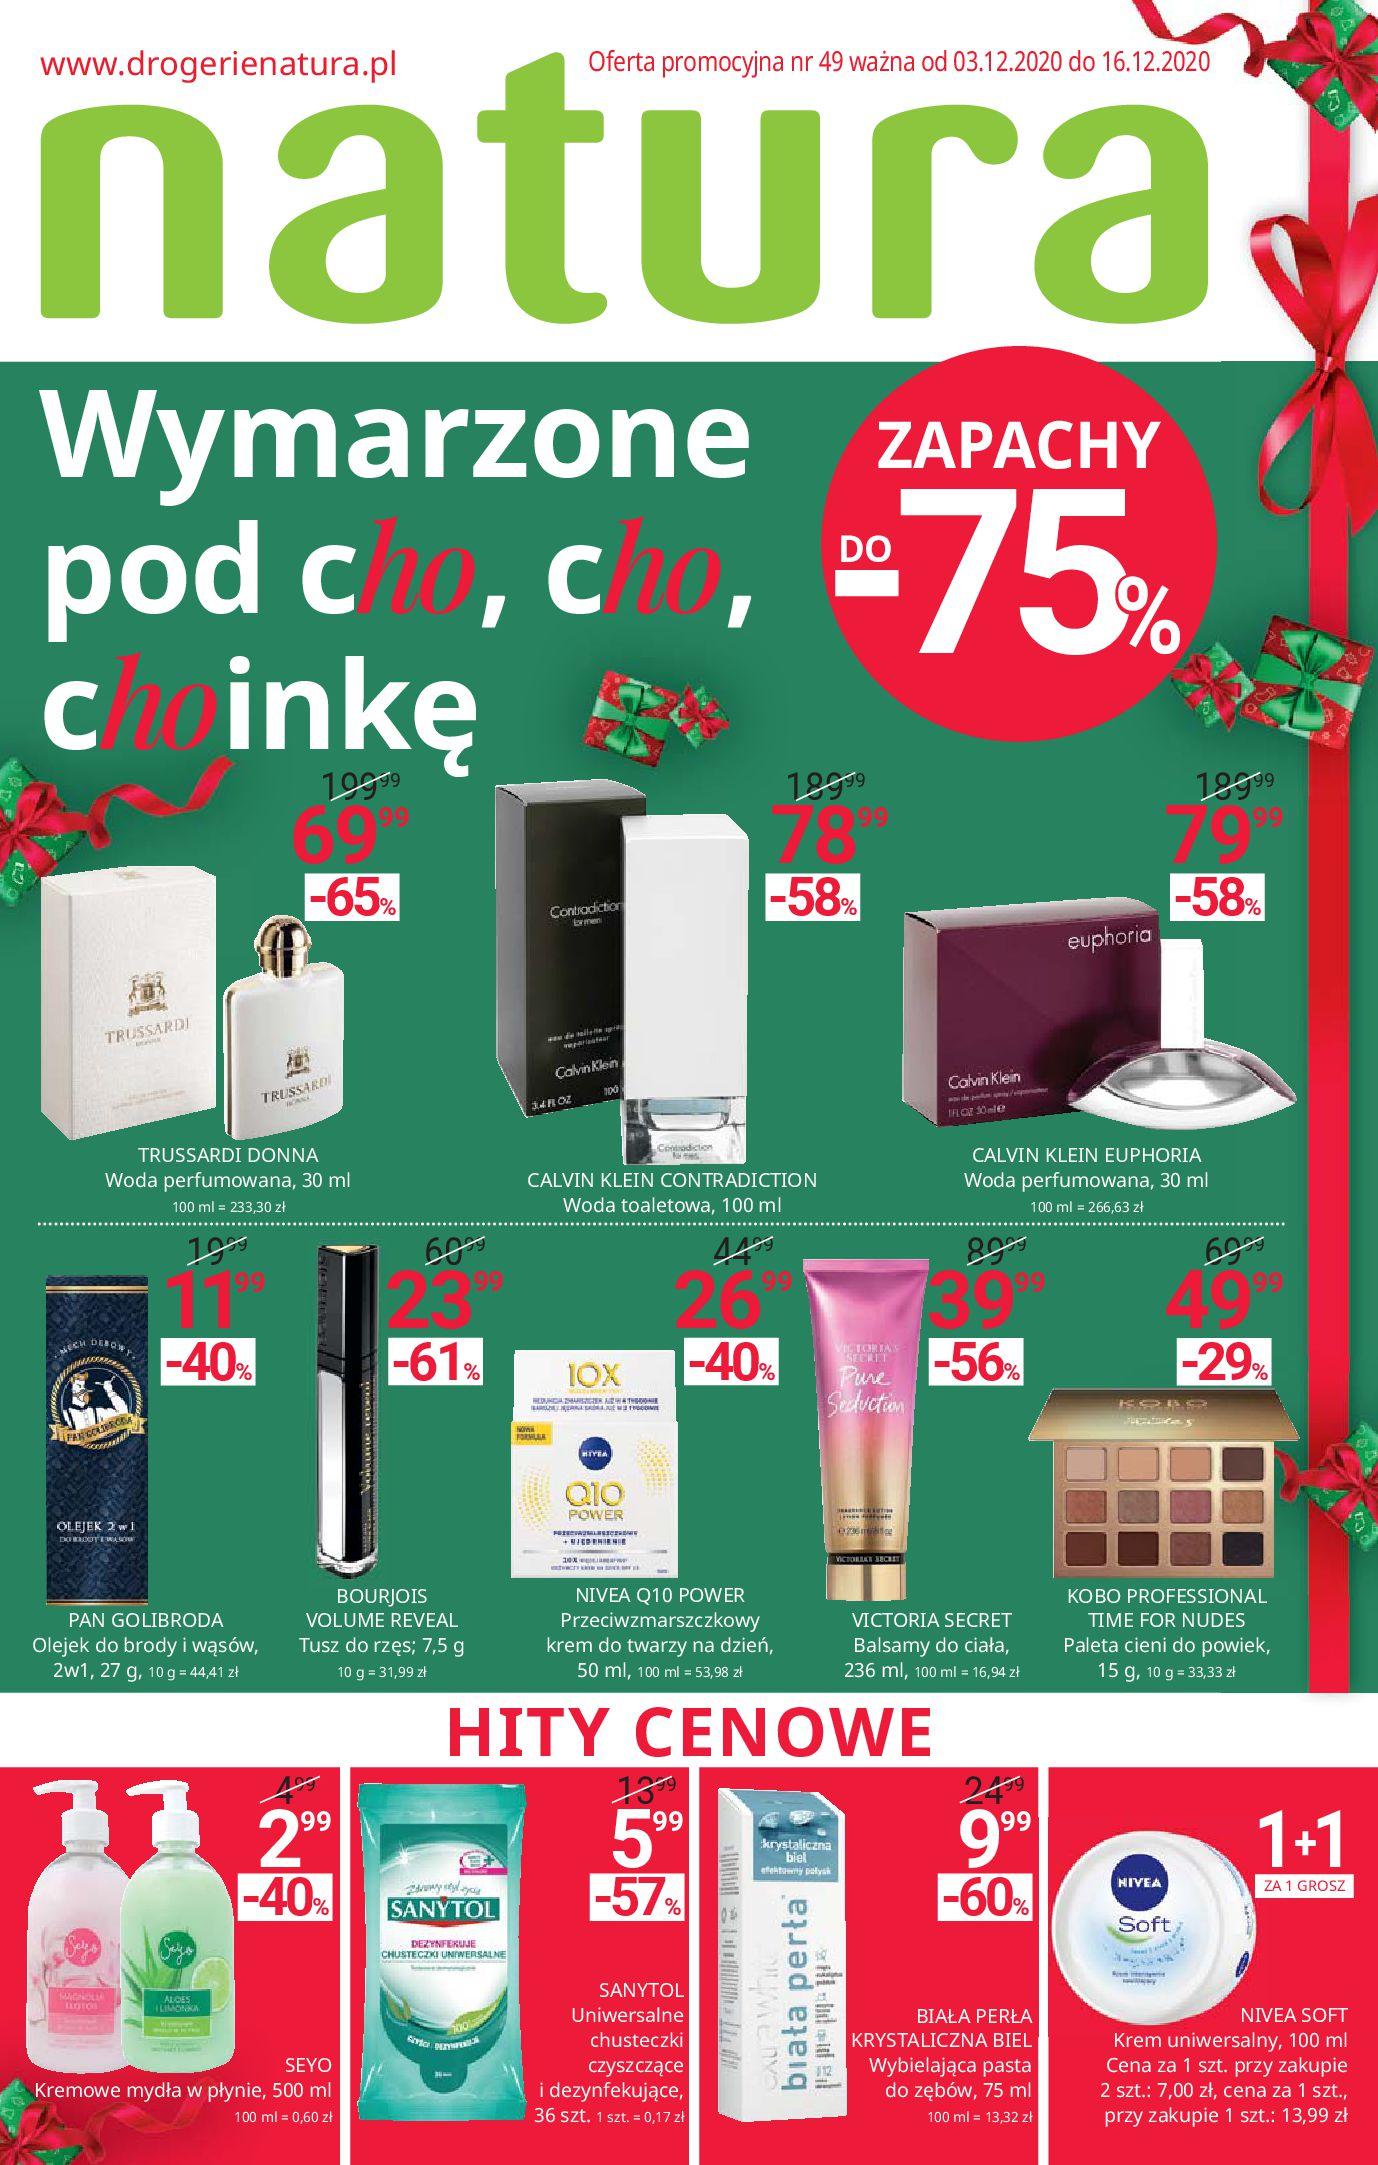 Drogerie Natura:  Gazetka promocyjna 02.12.2020